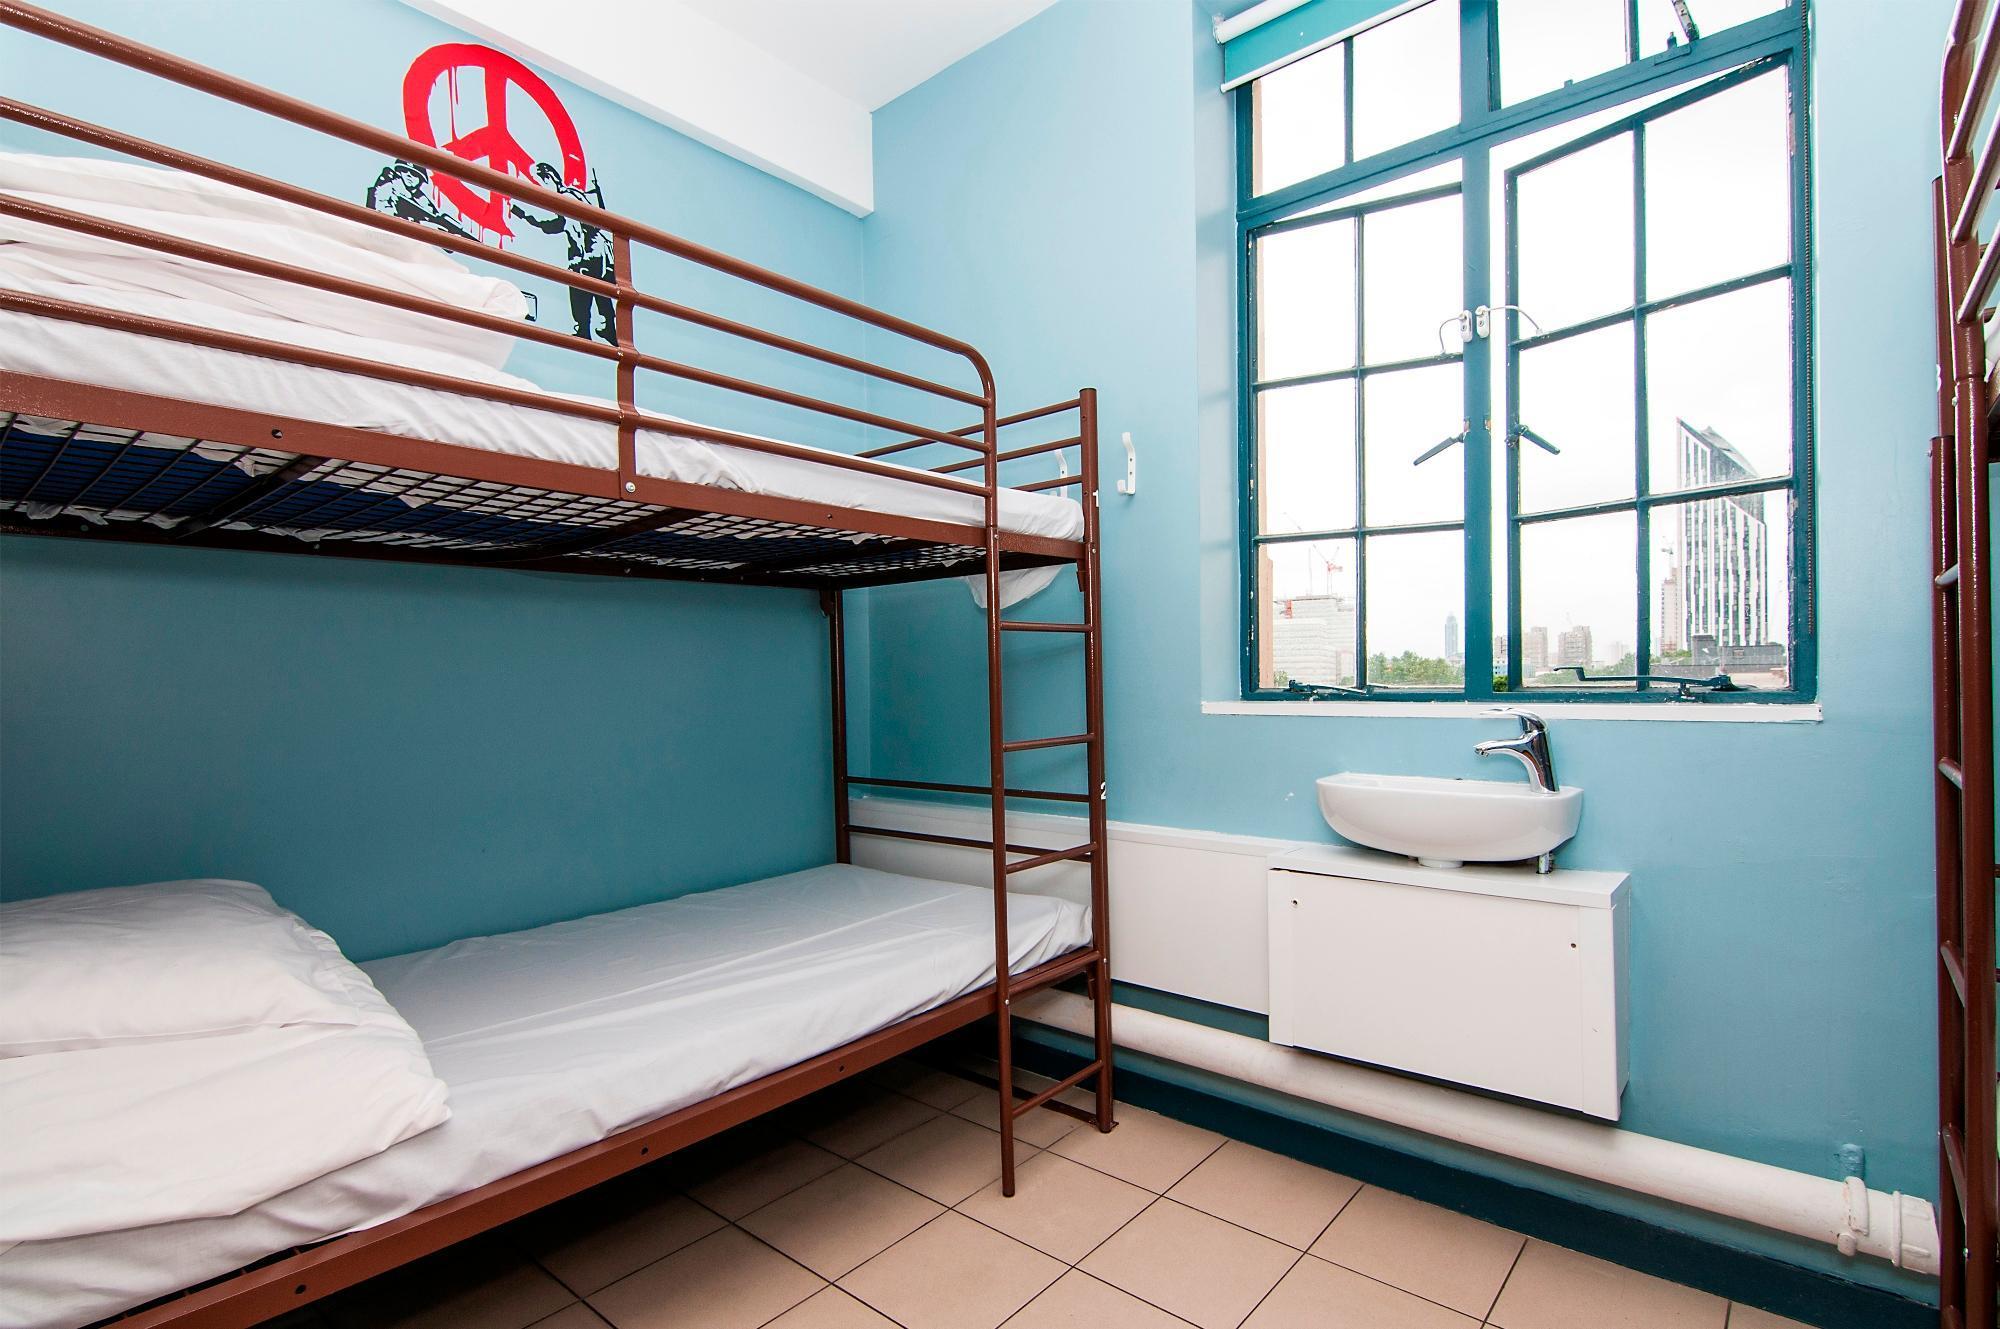 Best Price on RestUp London Hostel in London + Reviews!